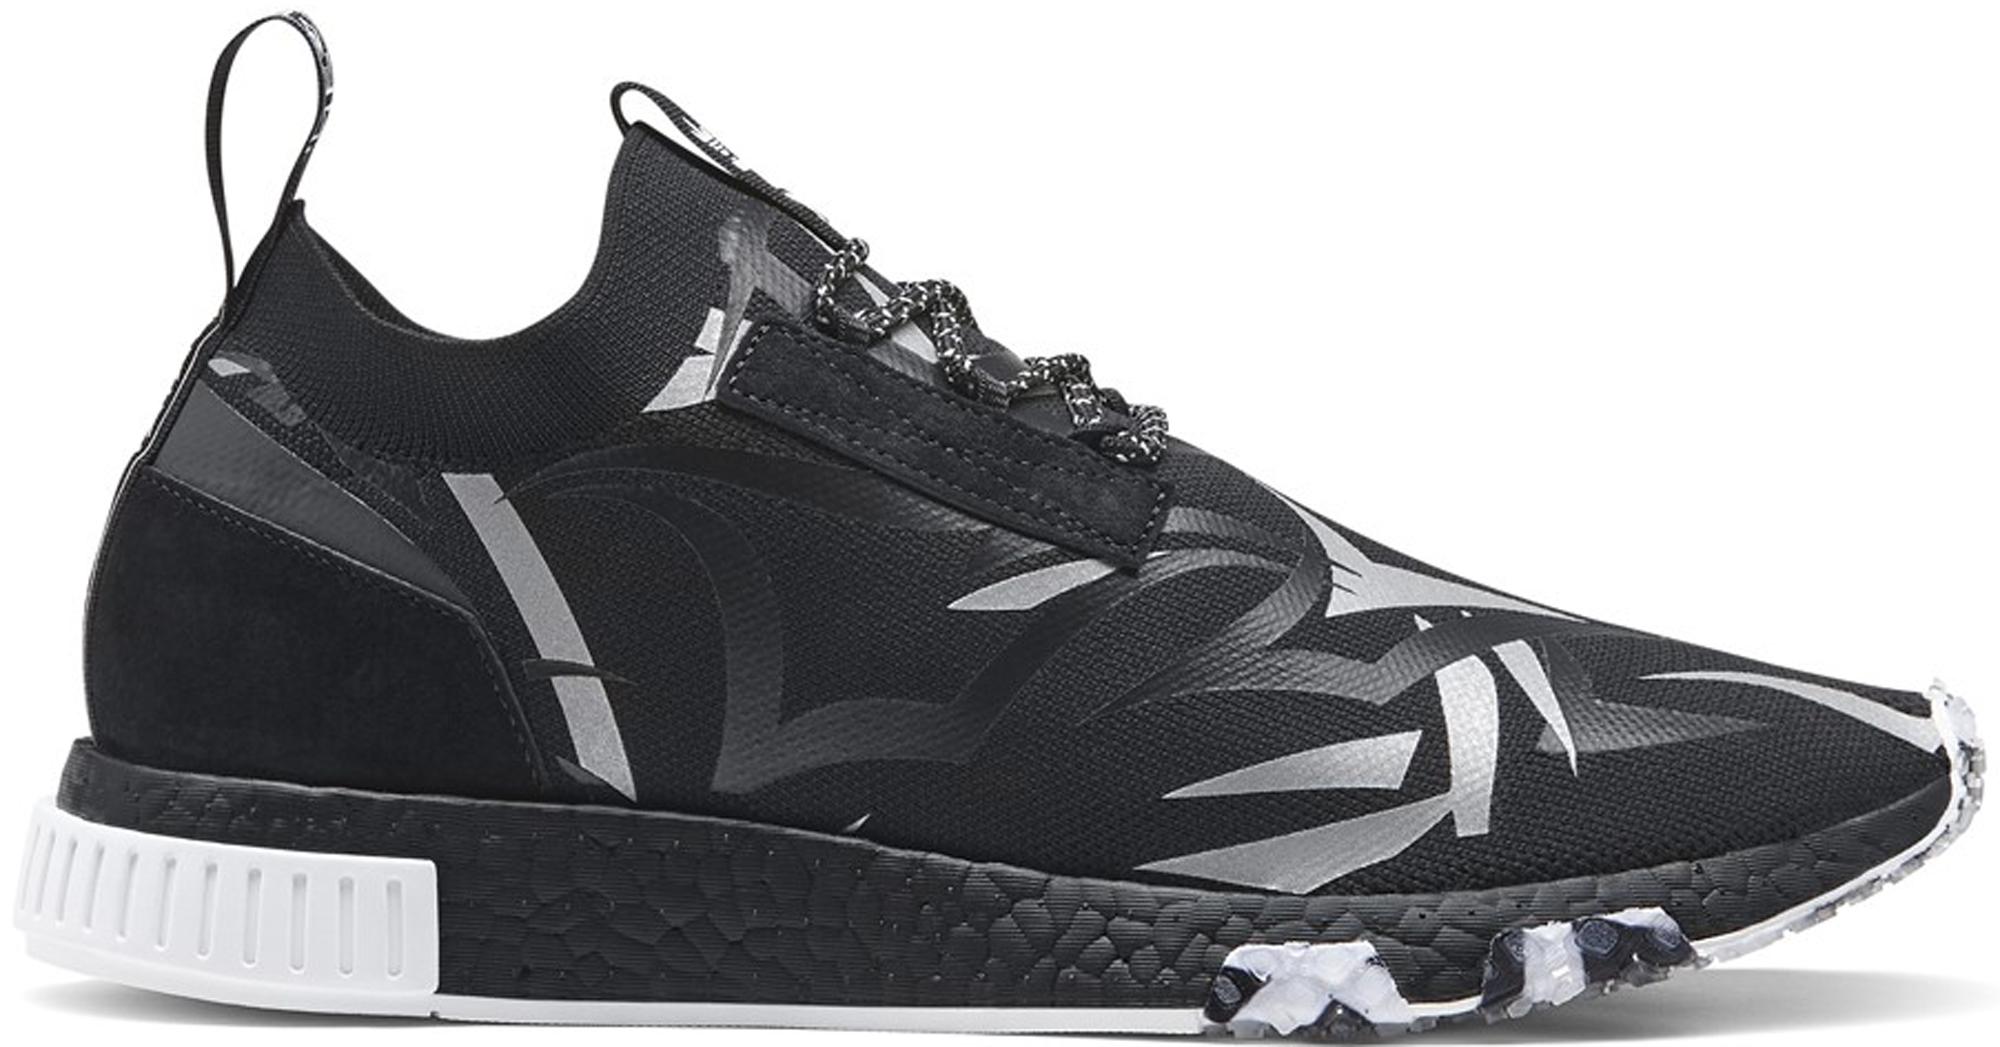 Adidas NMD Racer db1777 jugo HK